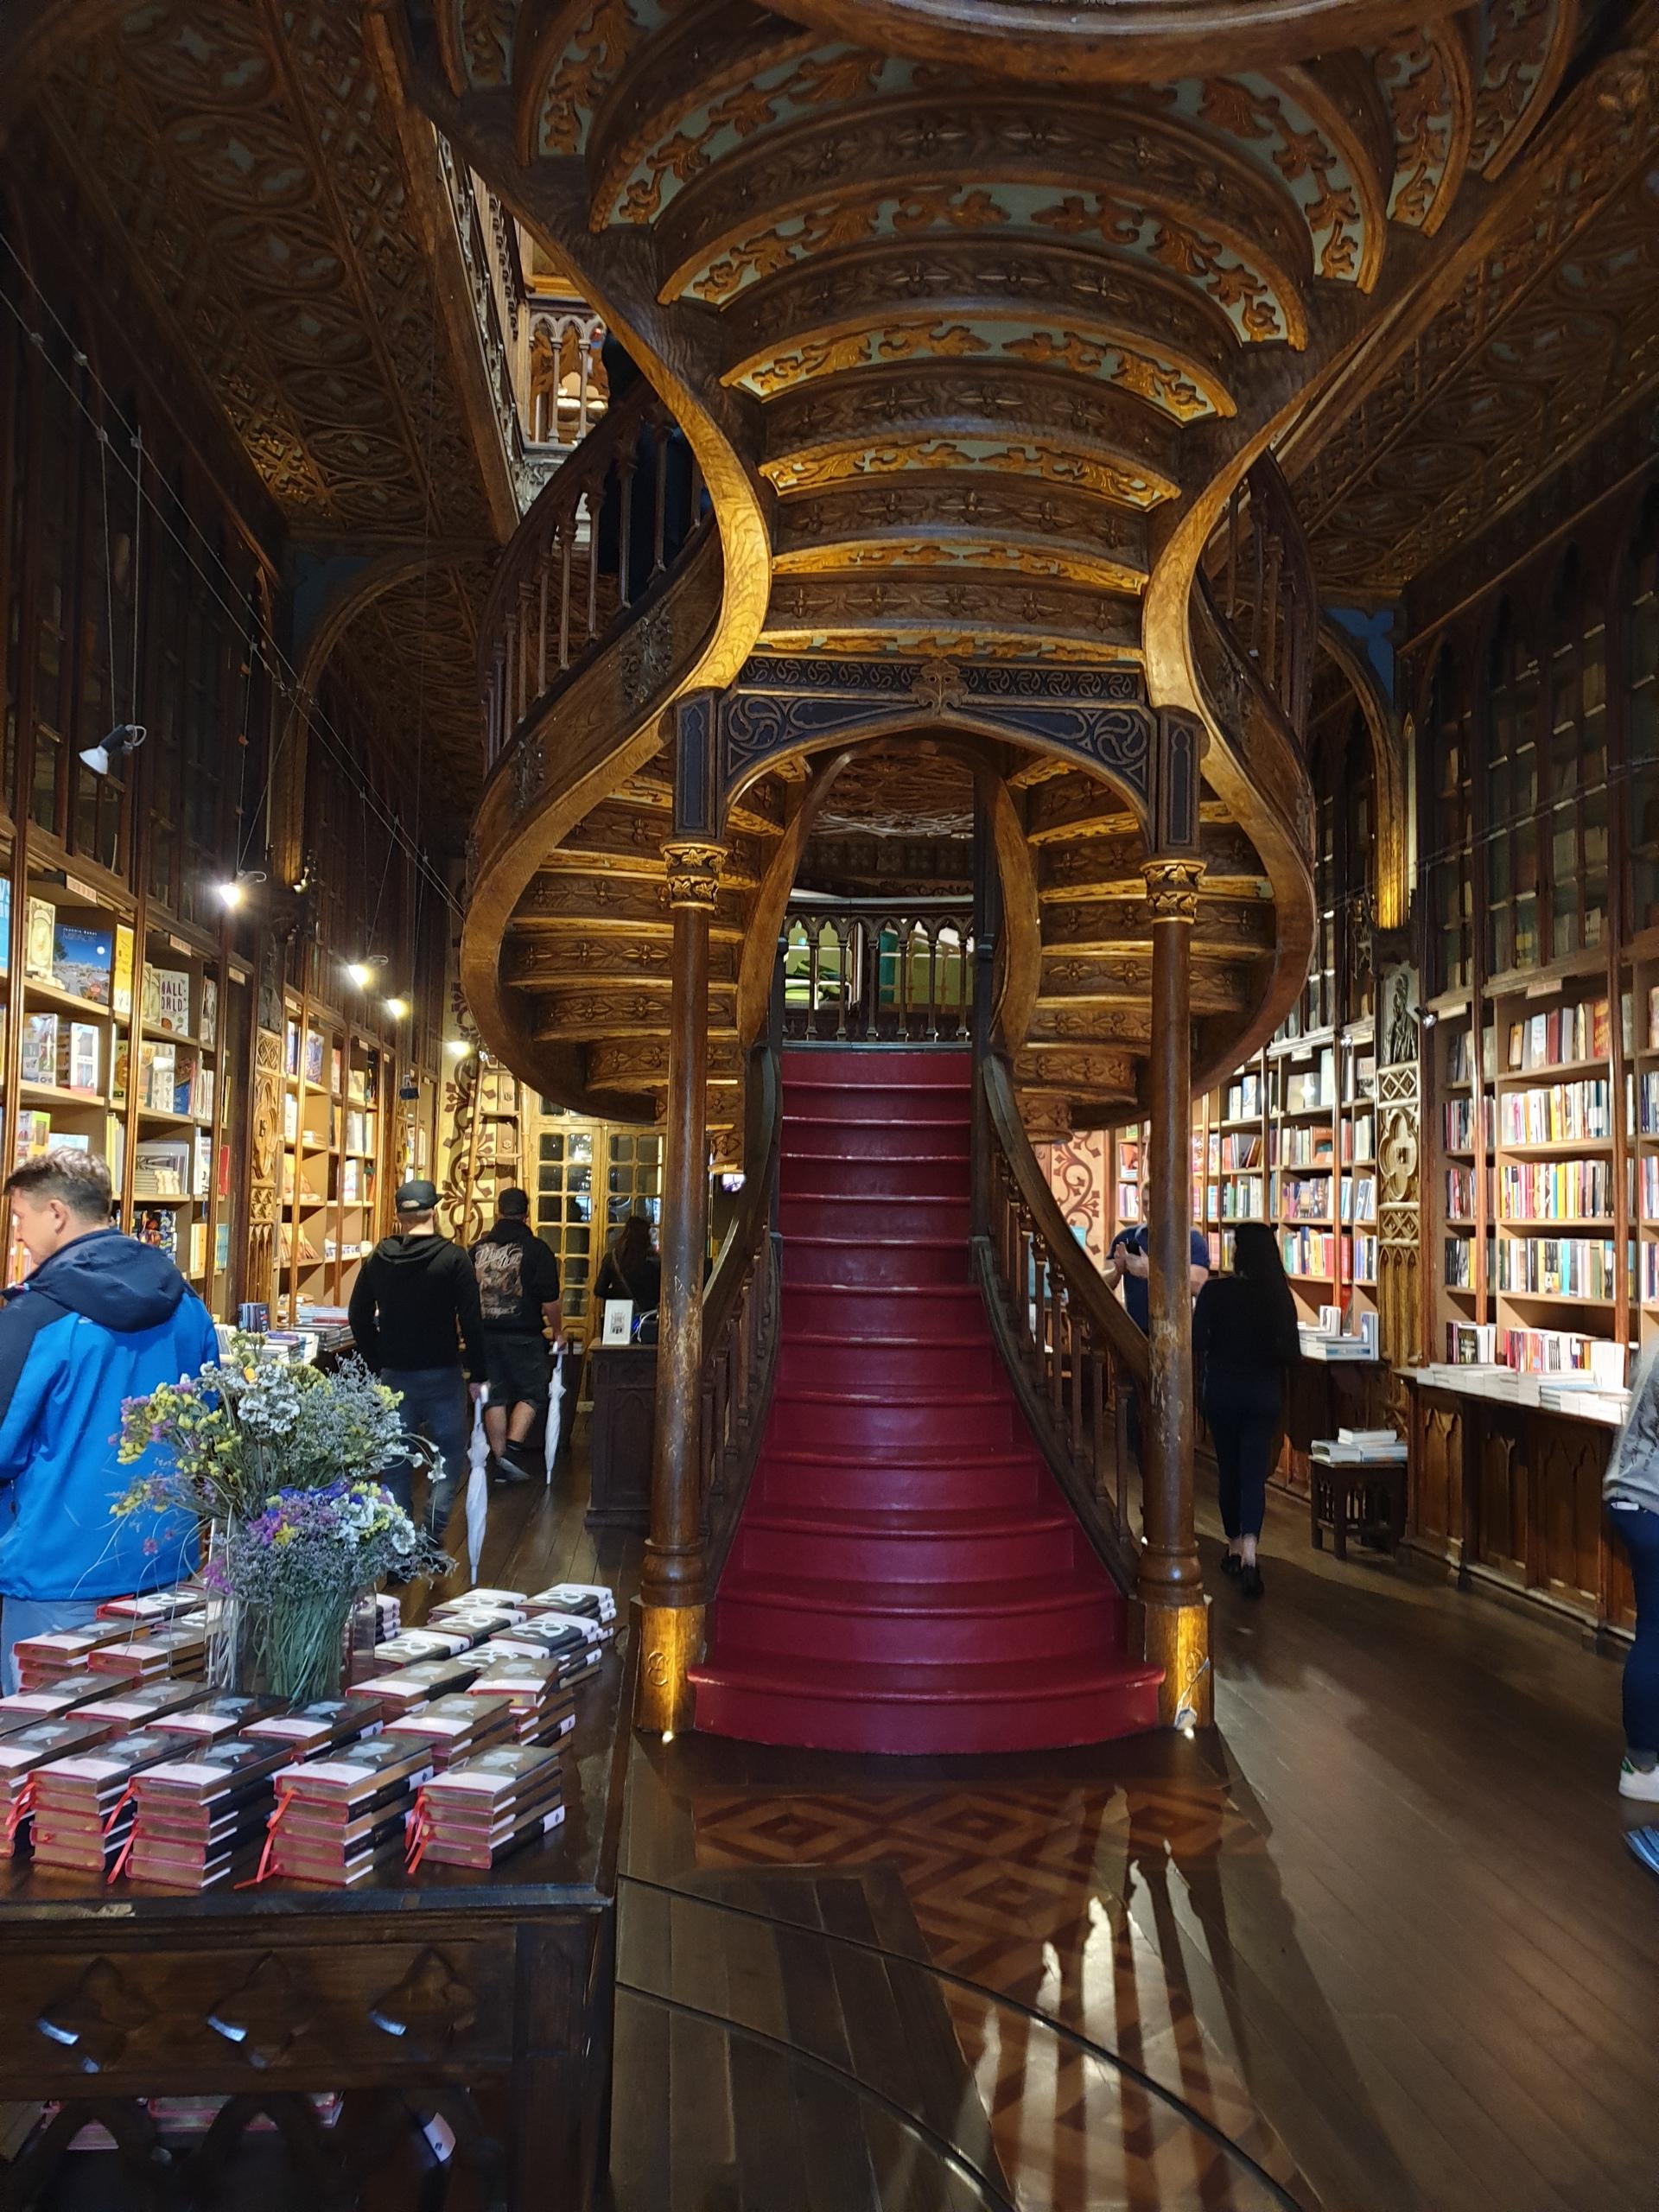 De prachtige boekenwinkel Lello e Irmão in Porto, Portugal